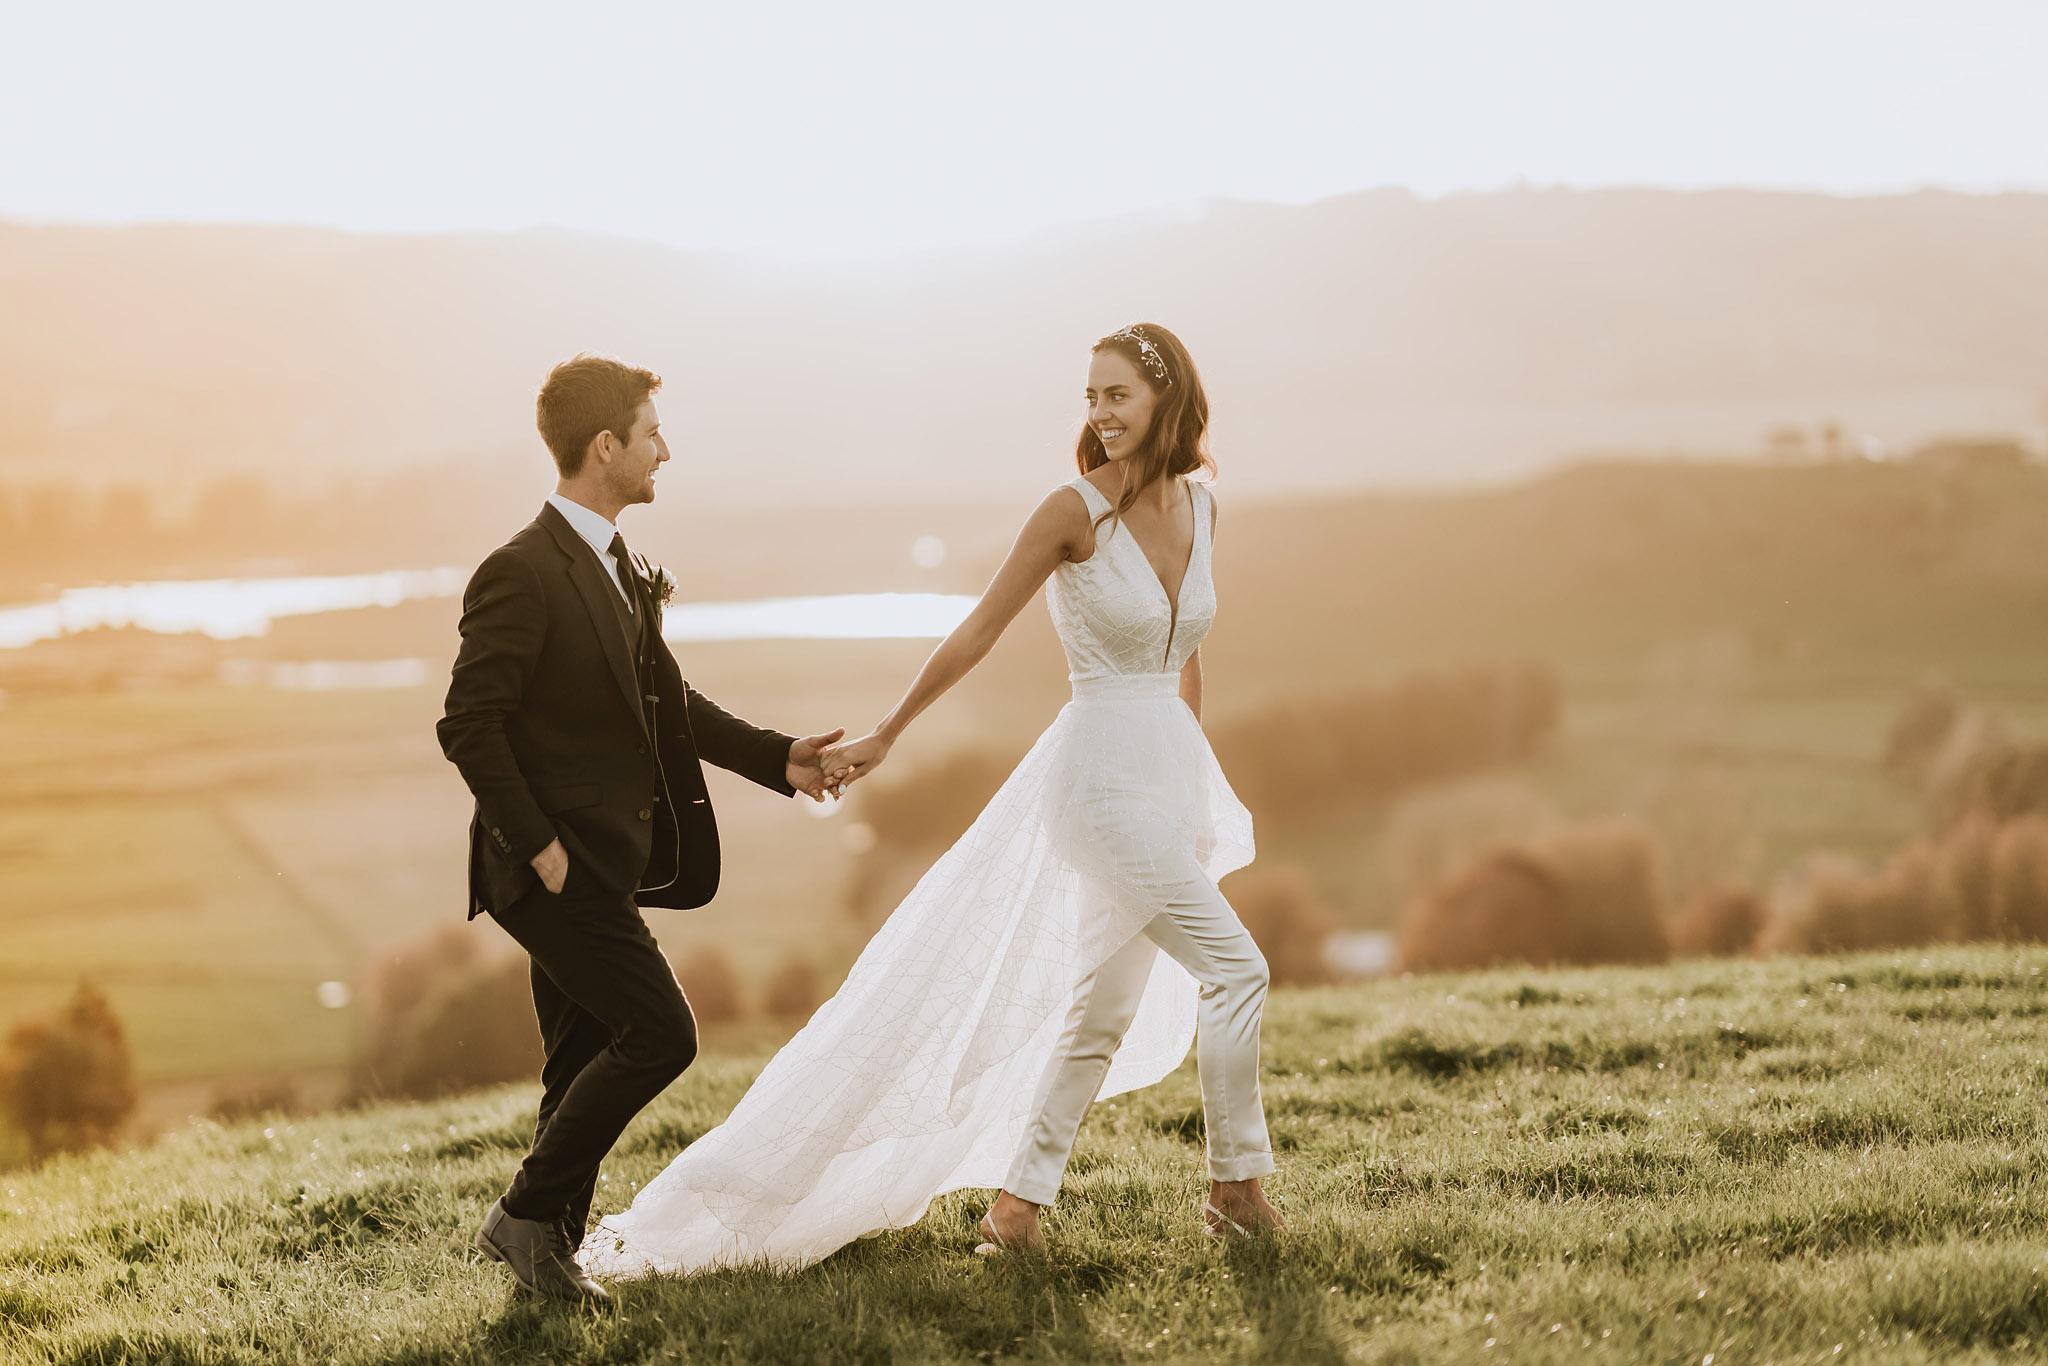 rambo-estrada-rubymatt-kauri-bay-boomrock-auckland-wedding-photographers-0689-c copy.jpg